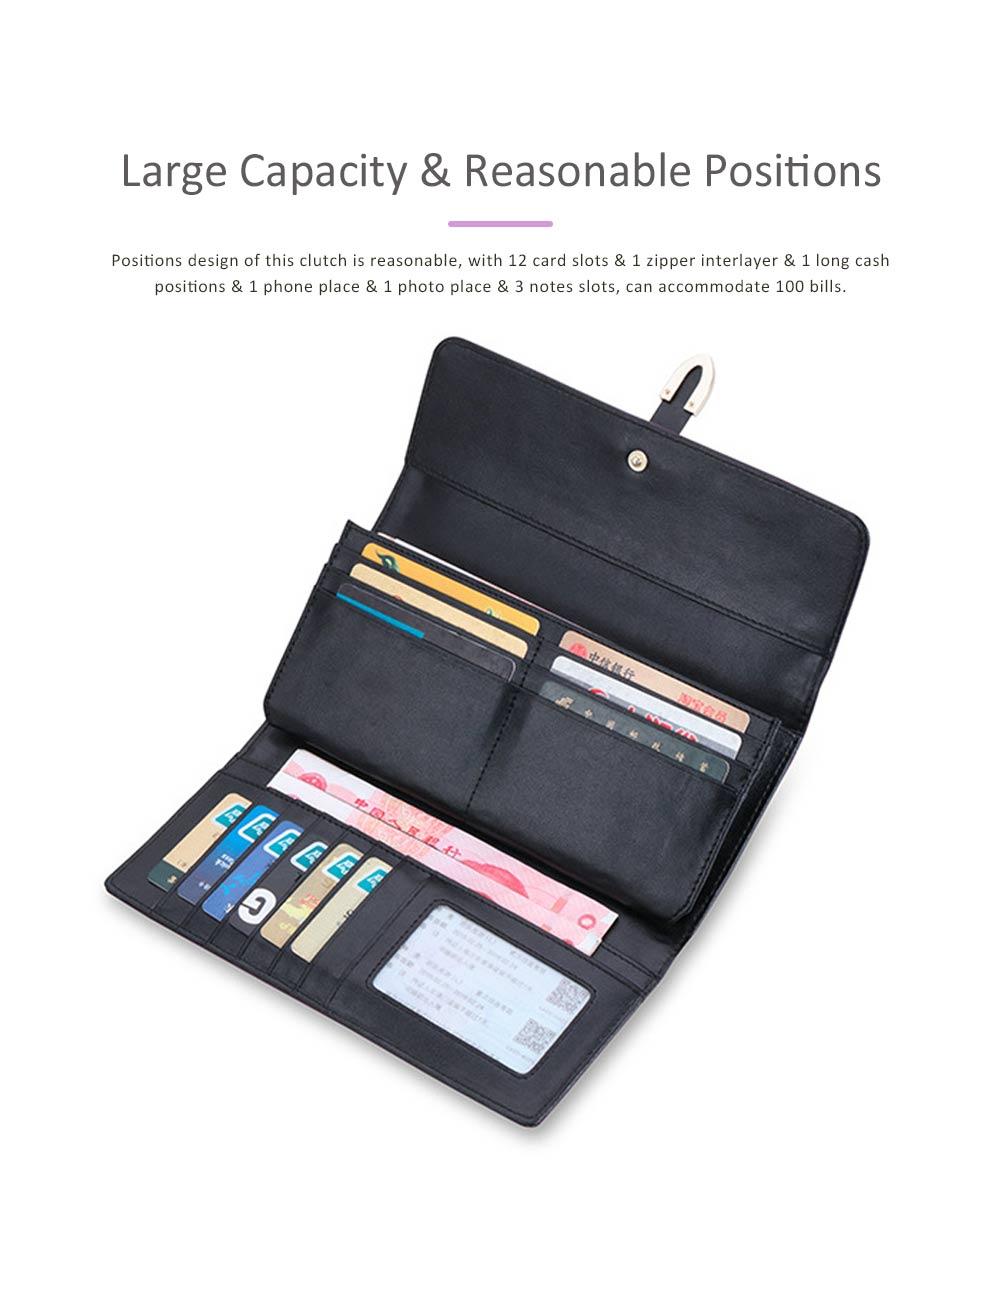 Genuine Leather Portable Purse Long Clutch Flap Bag, Oxhide 3 Folds Buckle Long Wallet Women Handbag Embossed Checks Card Holder 3